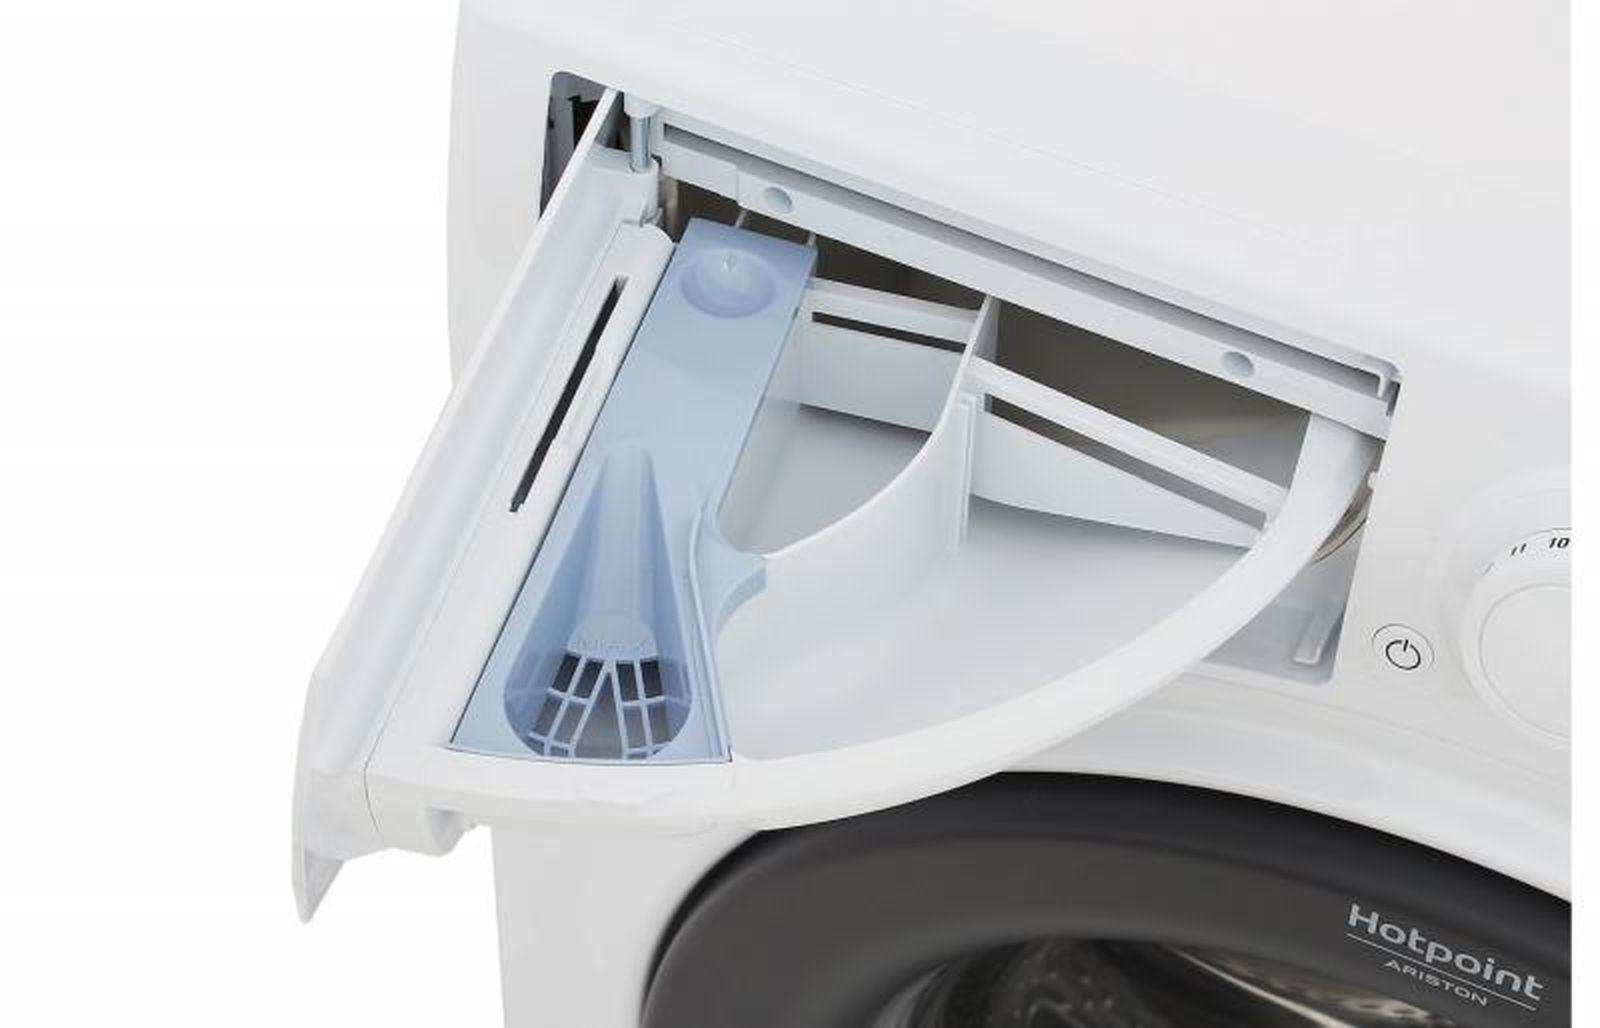 Стиральная машина Hotpoint-Ariston VMUL 501 B, 88958, белый Hotpoint-Ariston